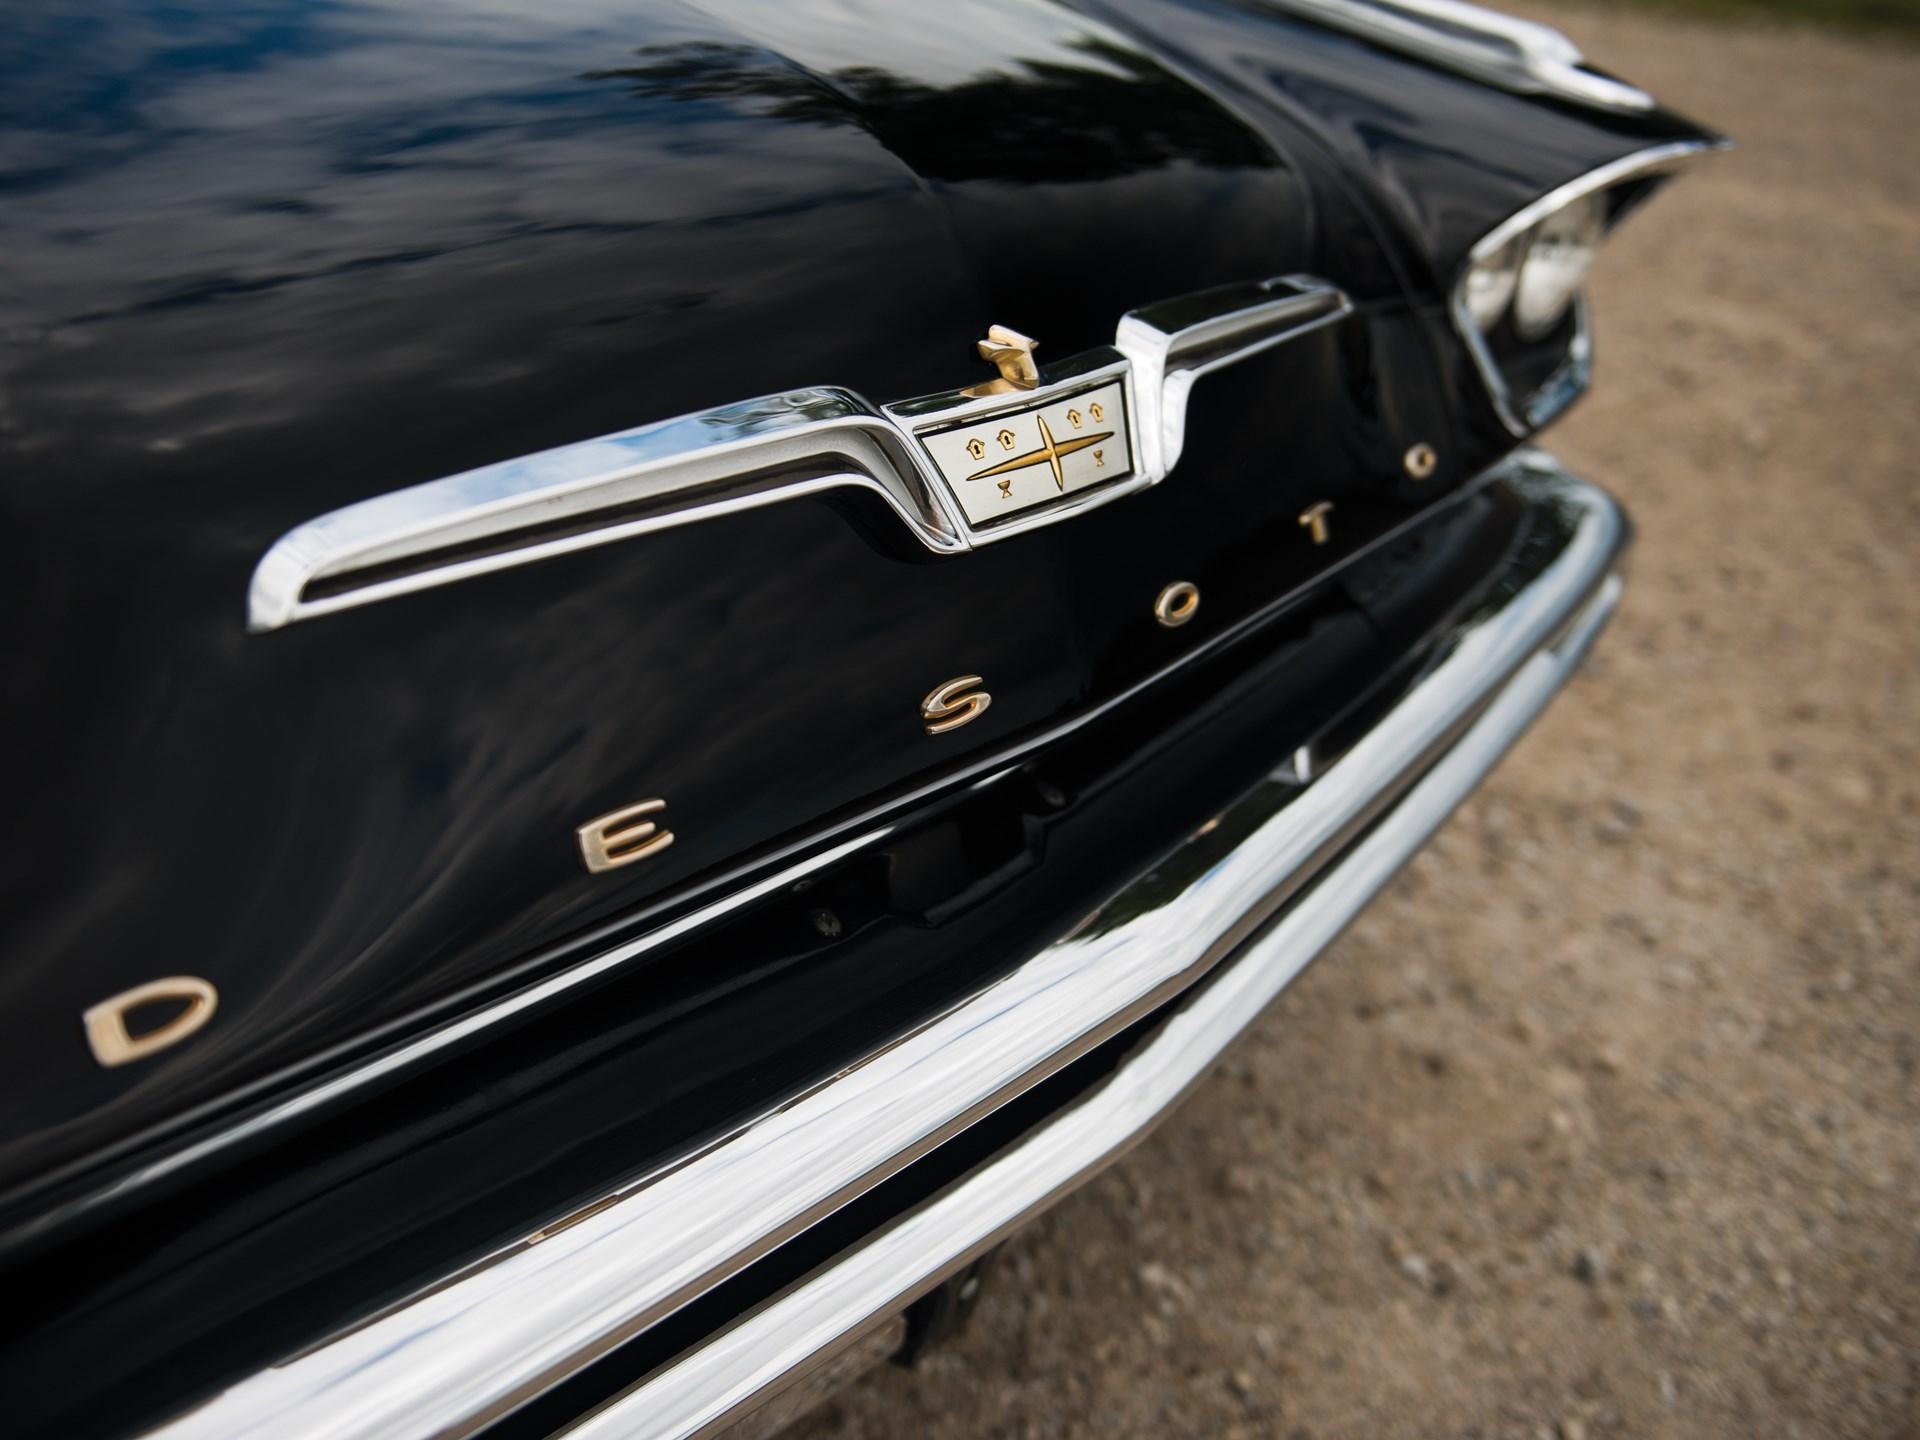 1957 DeSoto Adventurer Convertible desoto hood detail